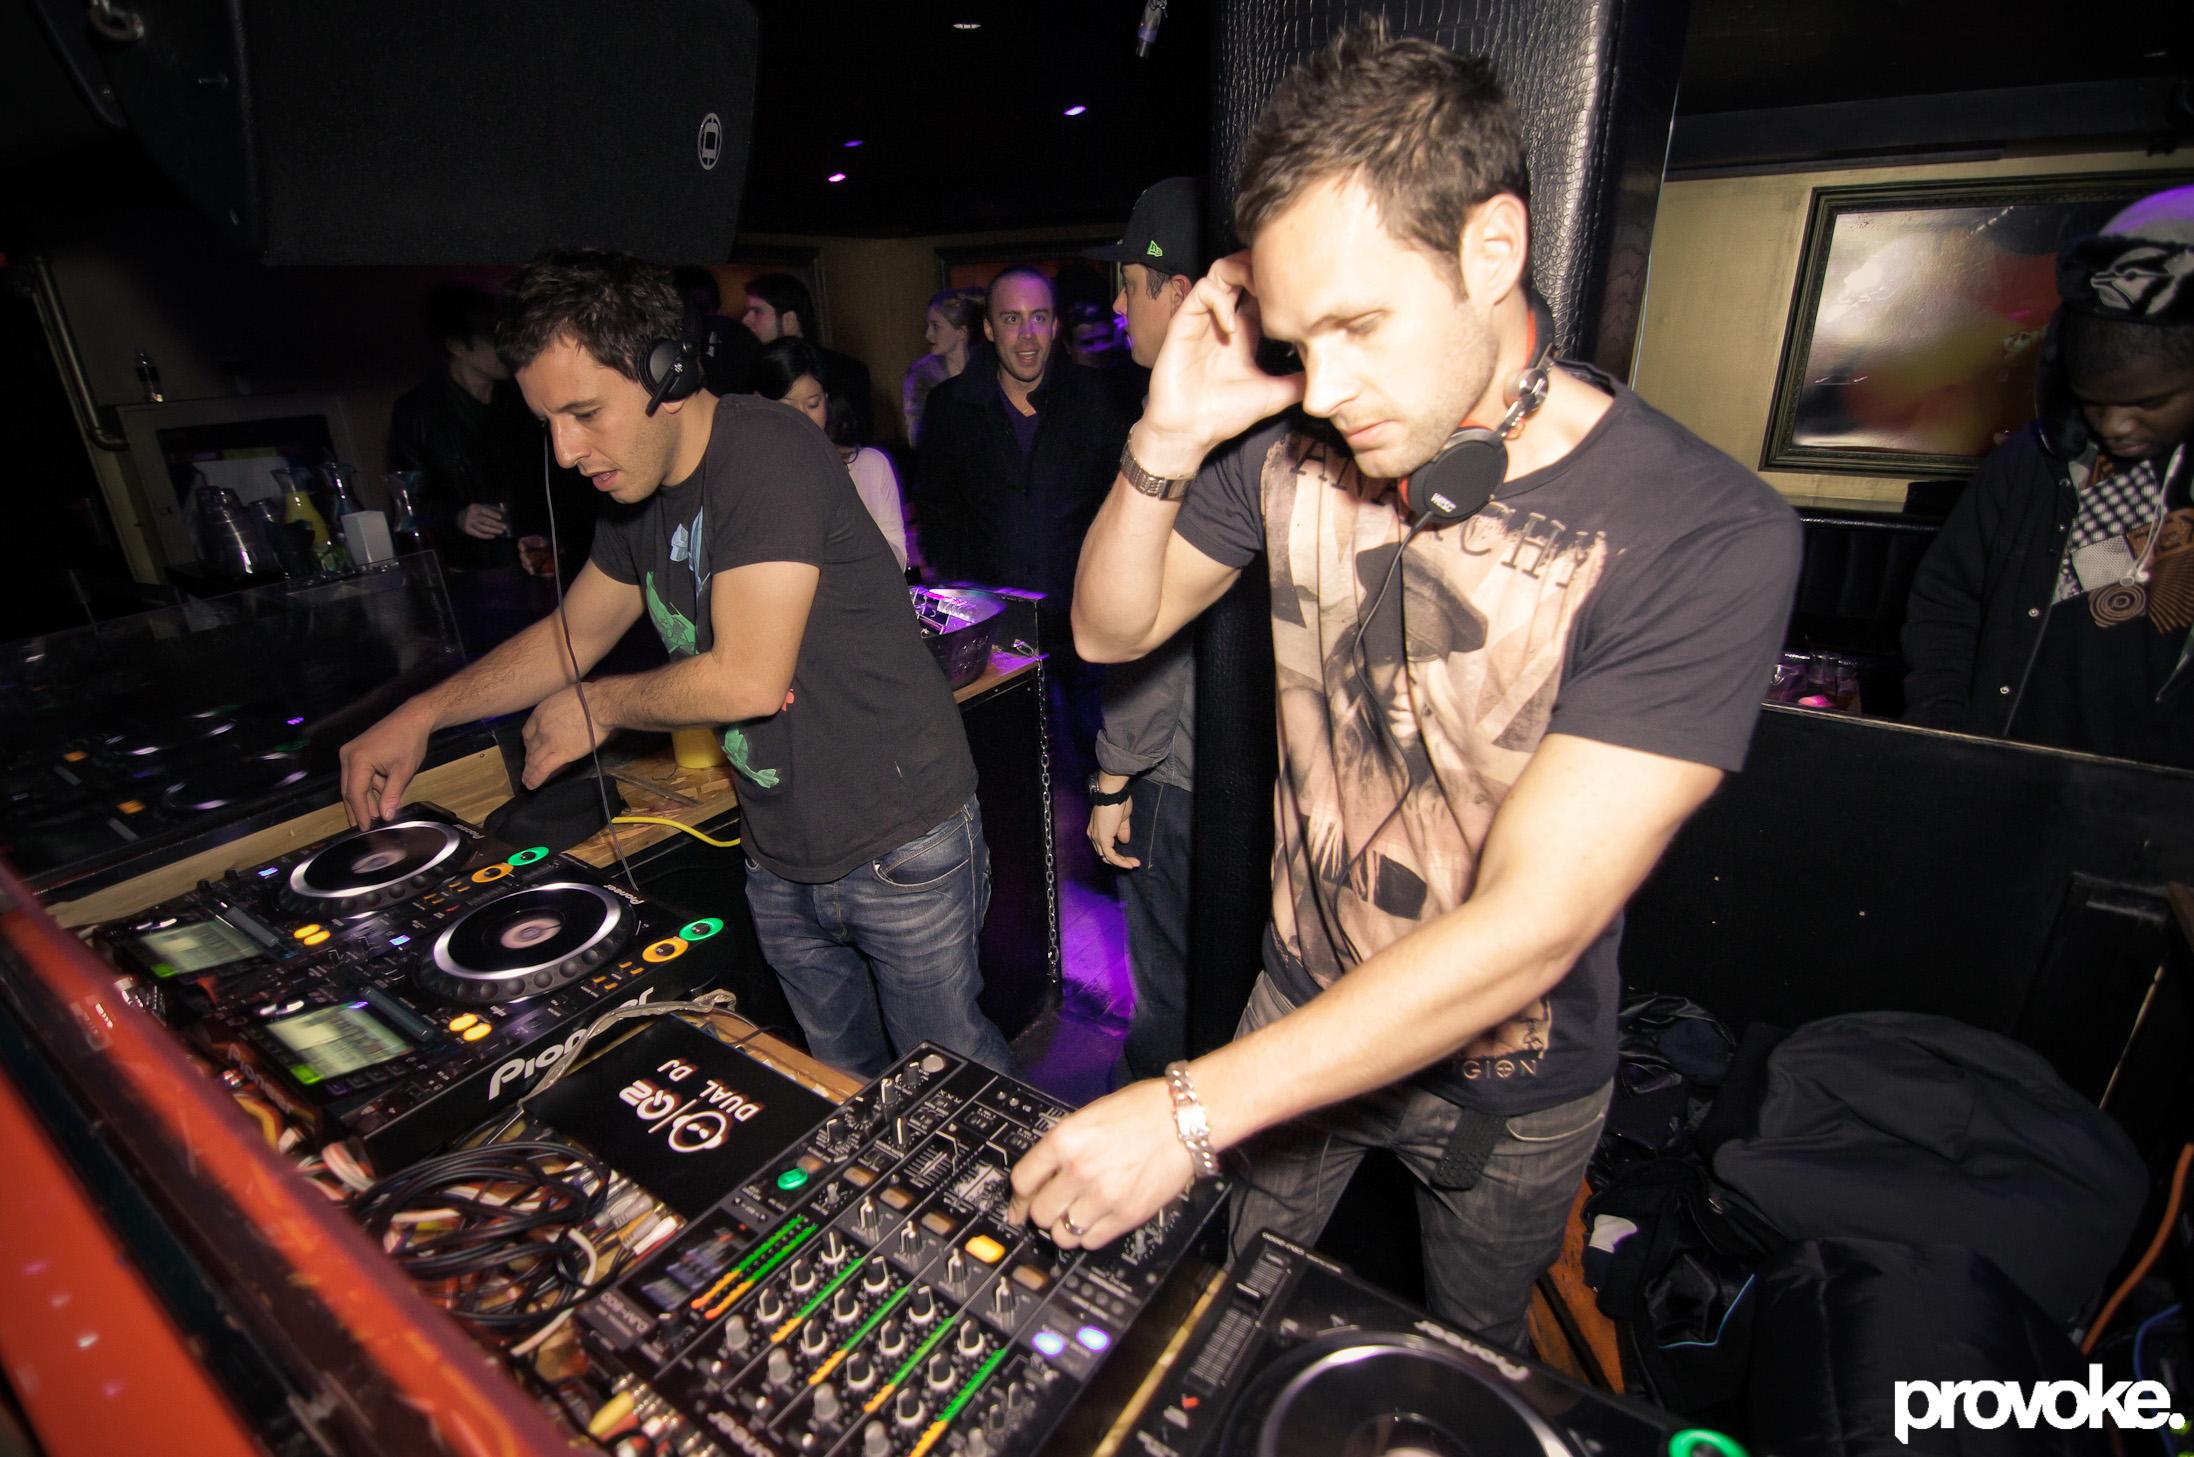 Prok & Fitch Bring Tech Vibes to Audio Nightclub